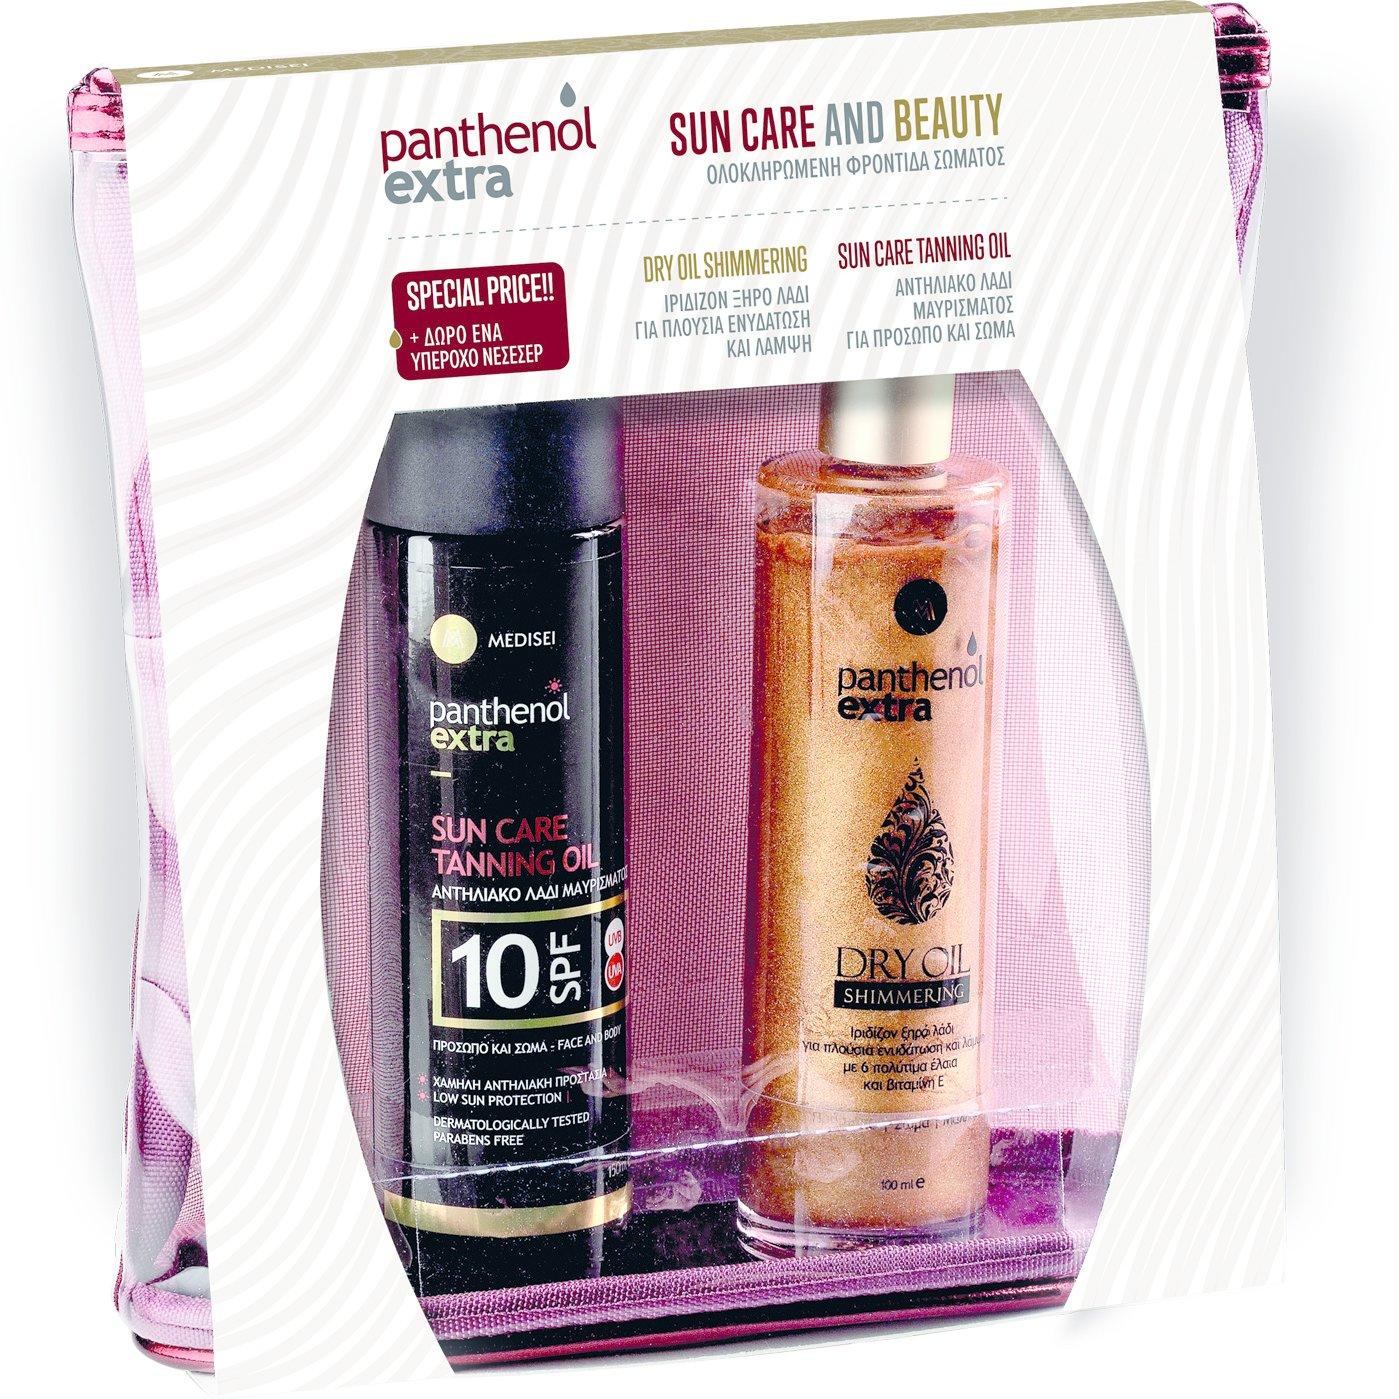 Medisei Panthenol Extra Set Sun Care Tanning Oil Spf10 150ml & Panthenol Extra Dry Oil Shimmering 100ml & Νεσεσερ